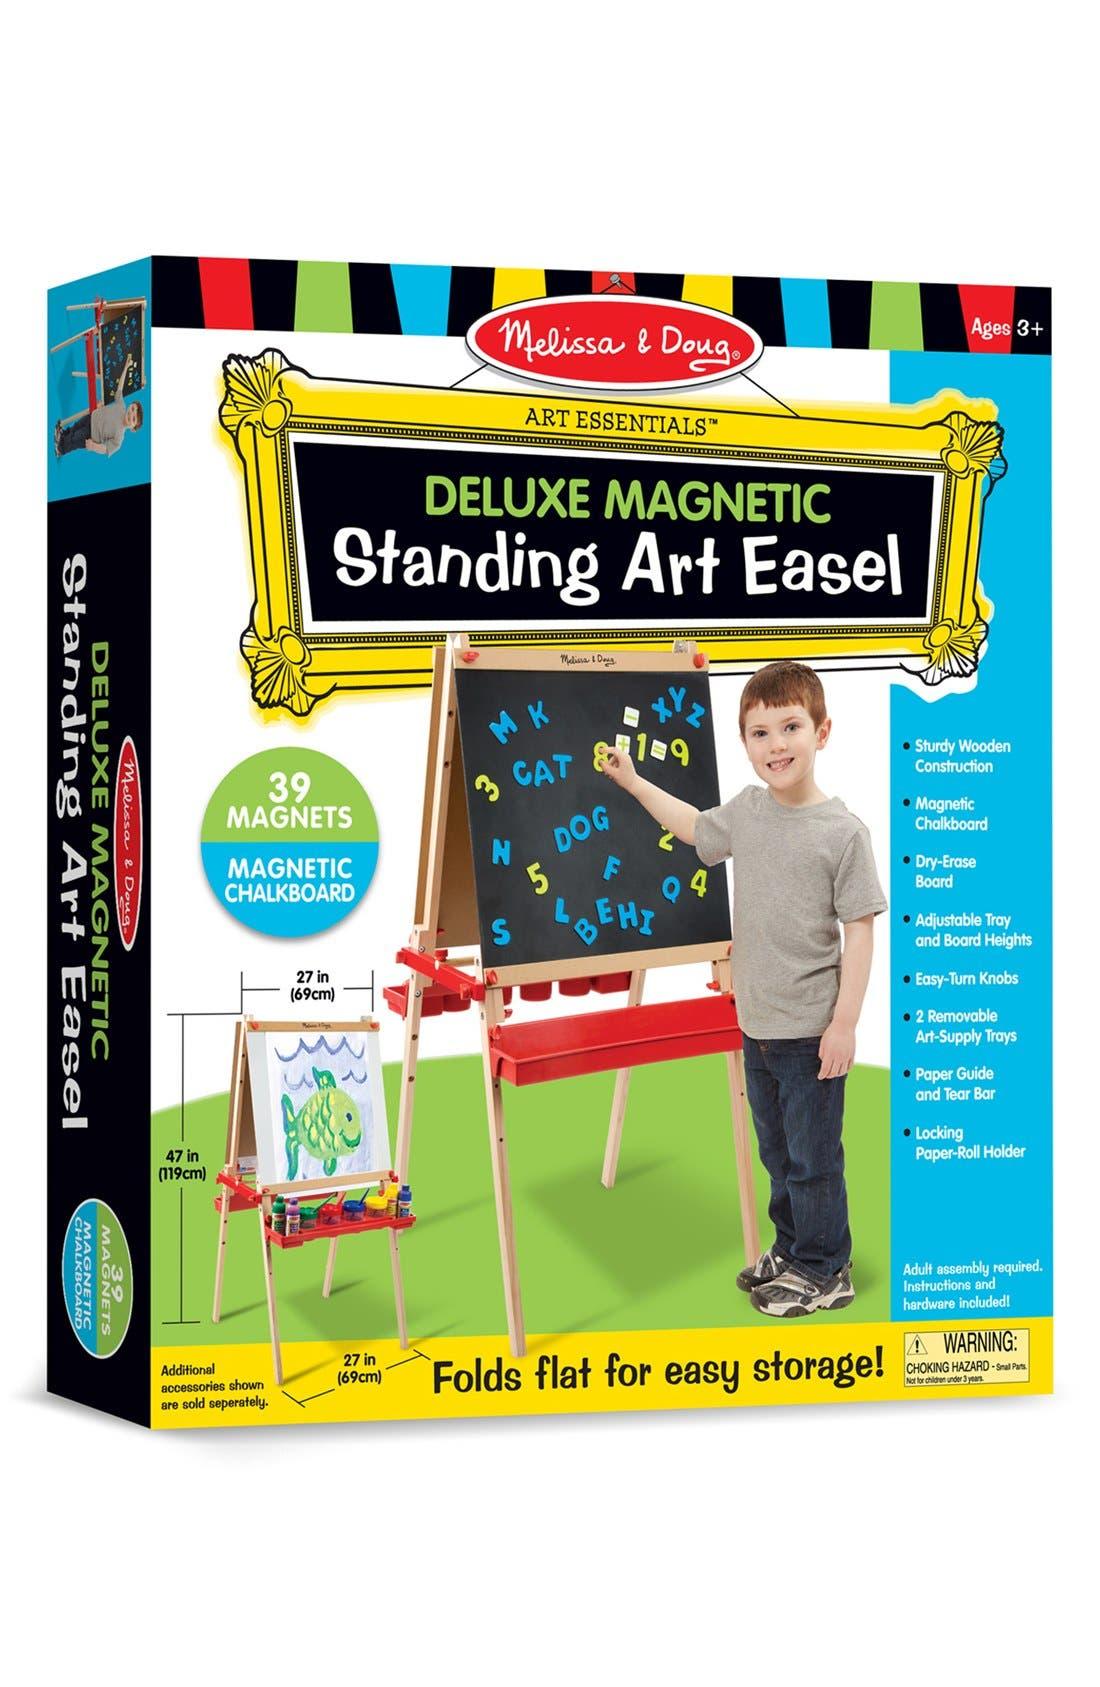 MELISSA & DOUG Wooden Easel with Chalkboard and